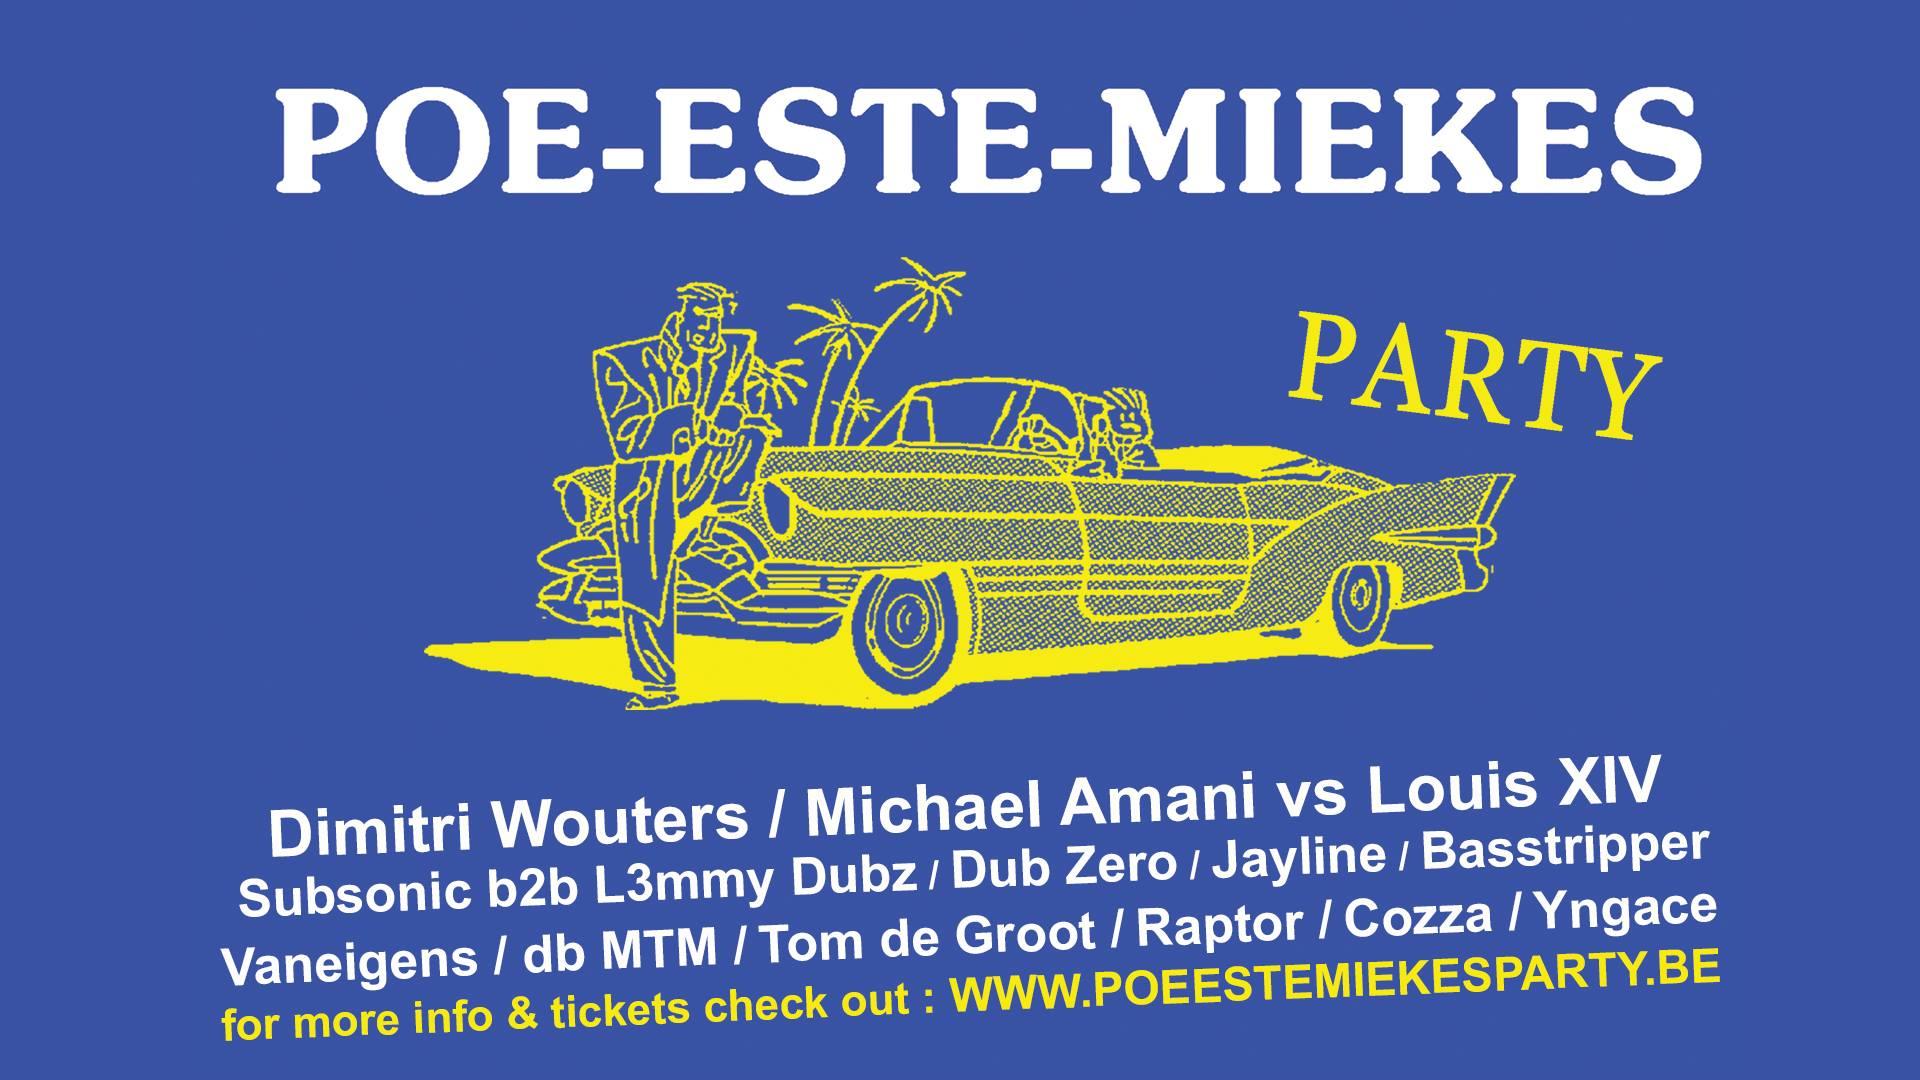 Poe-este-Miekes Party